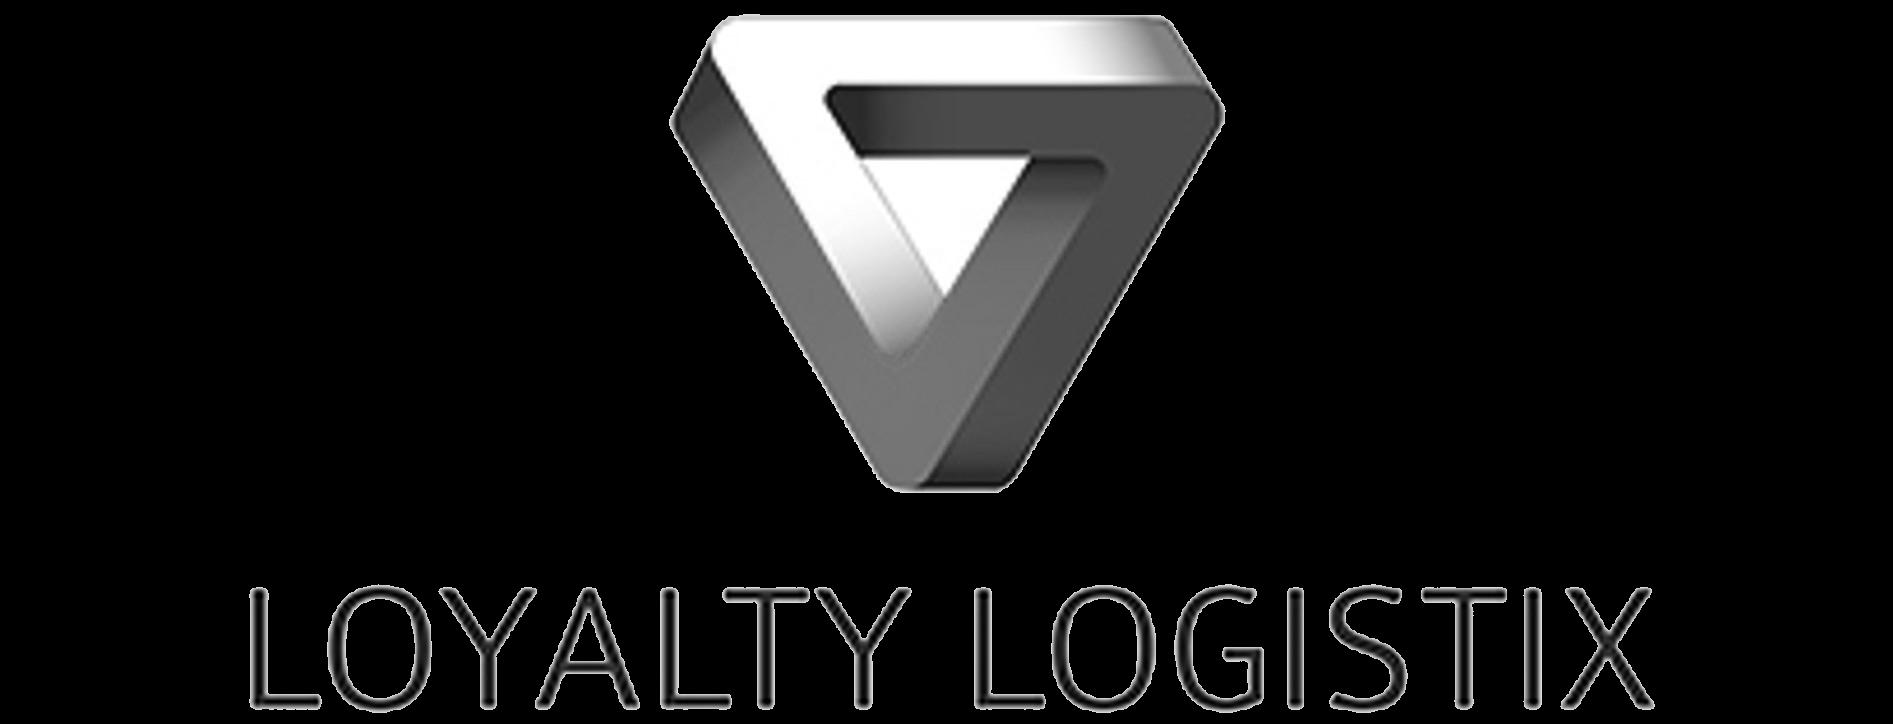 Loyalty Logistix